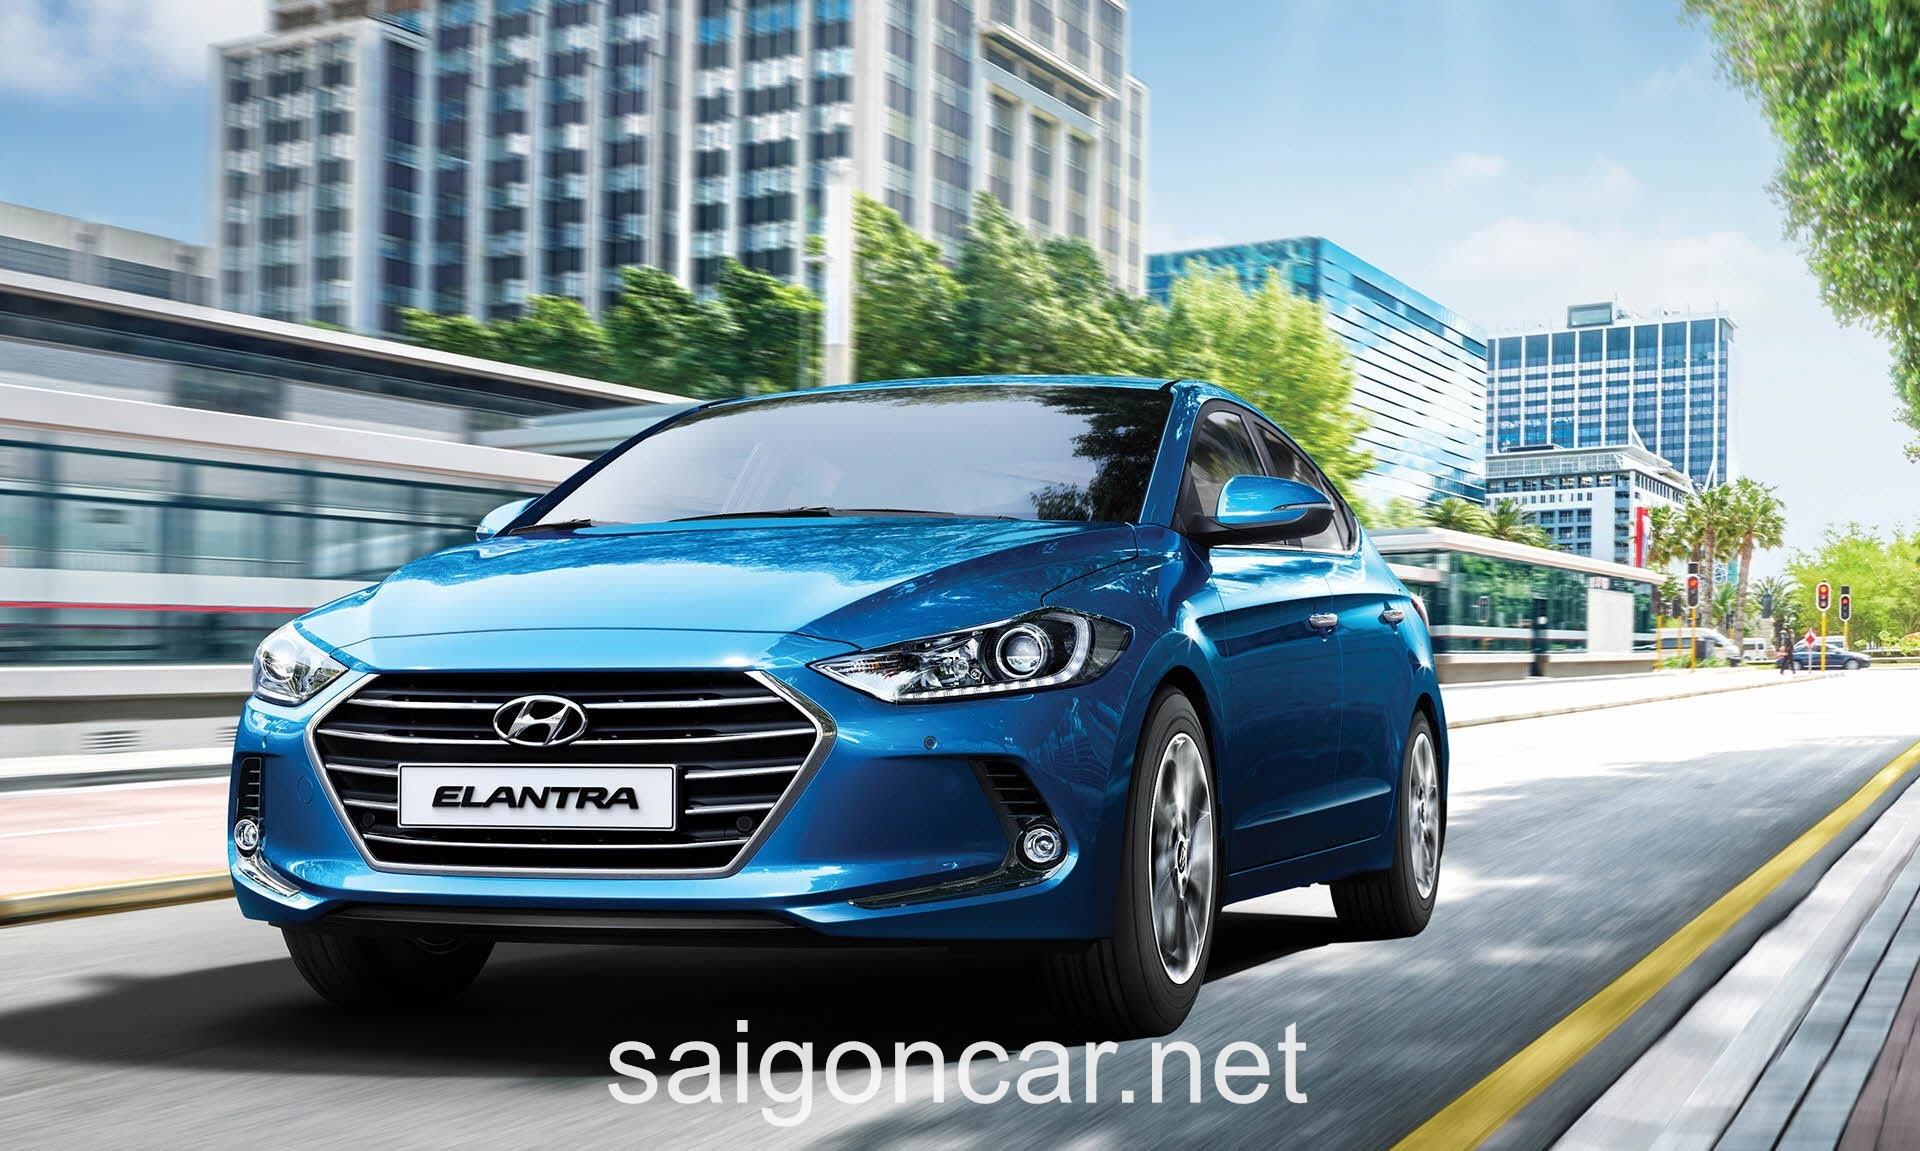 Hyundai Elantra Tong Quan